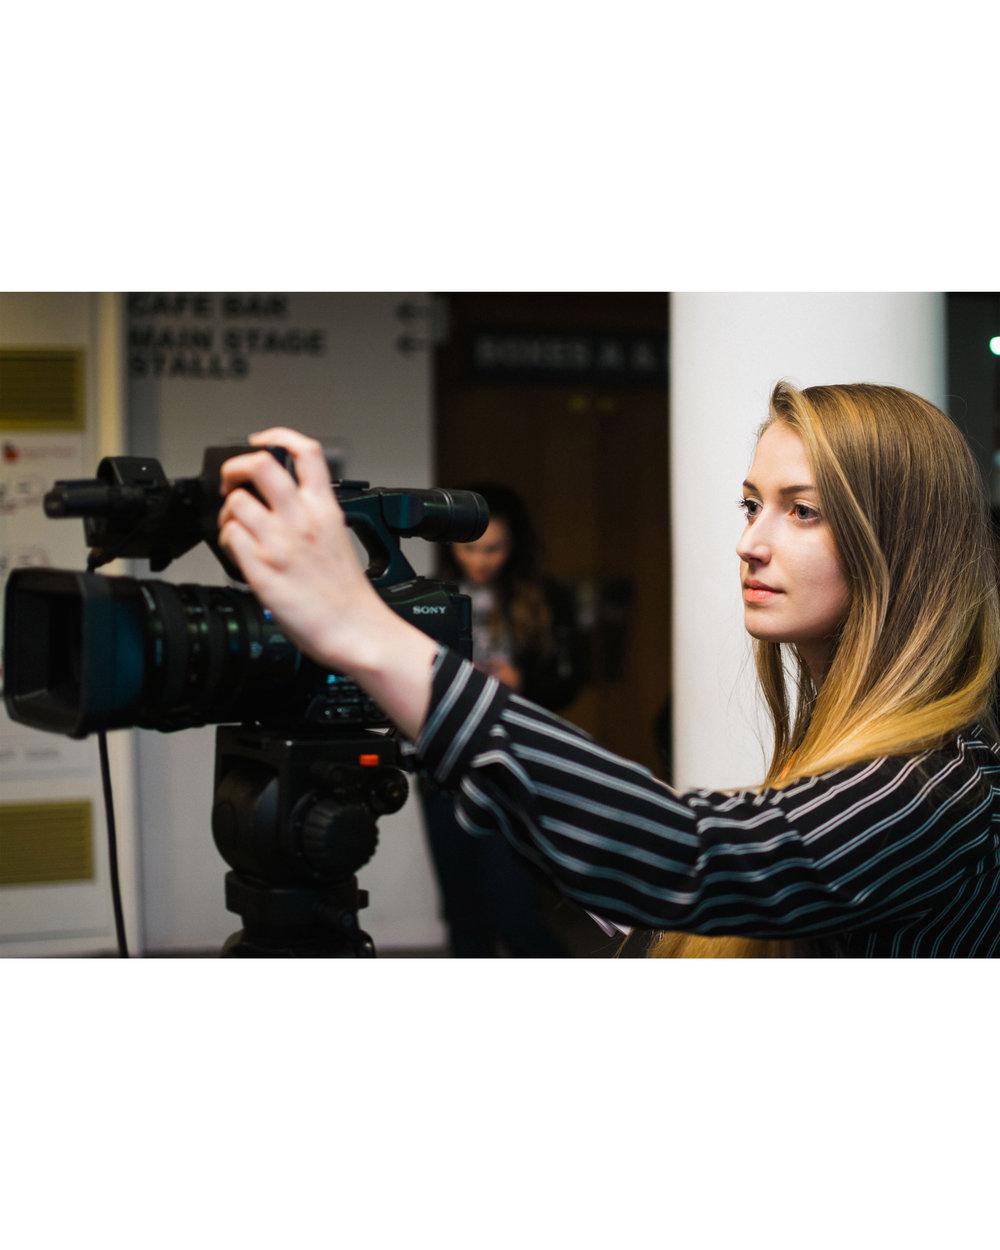 Louisa filming portrait